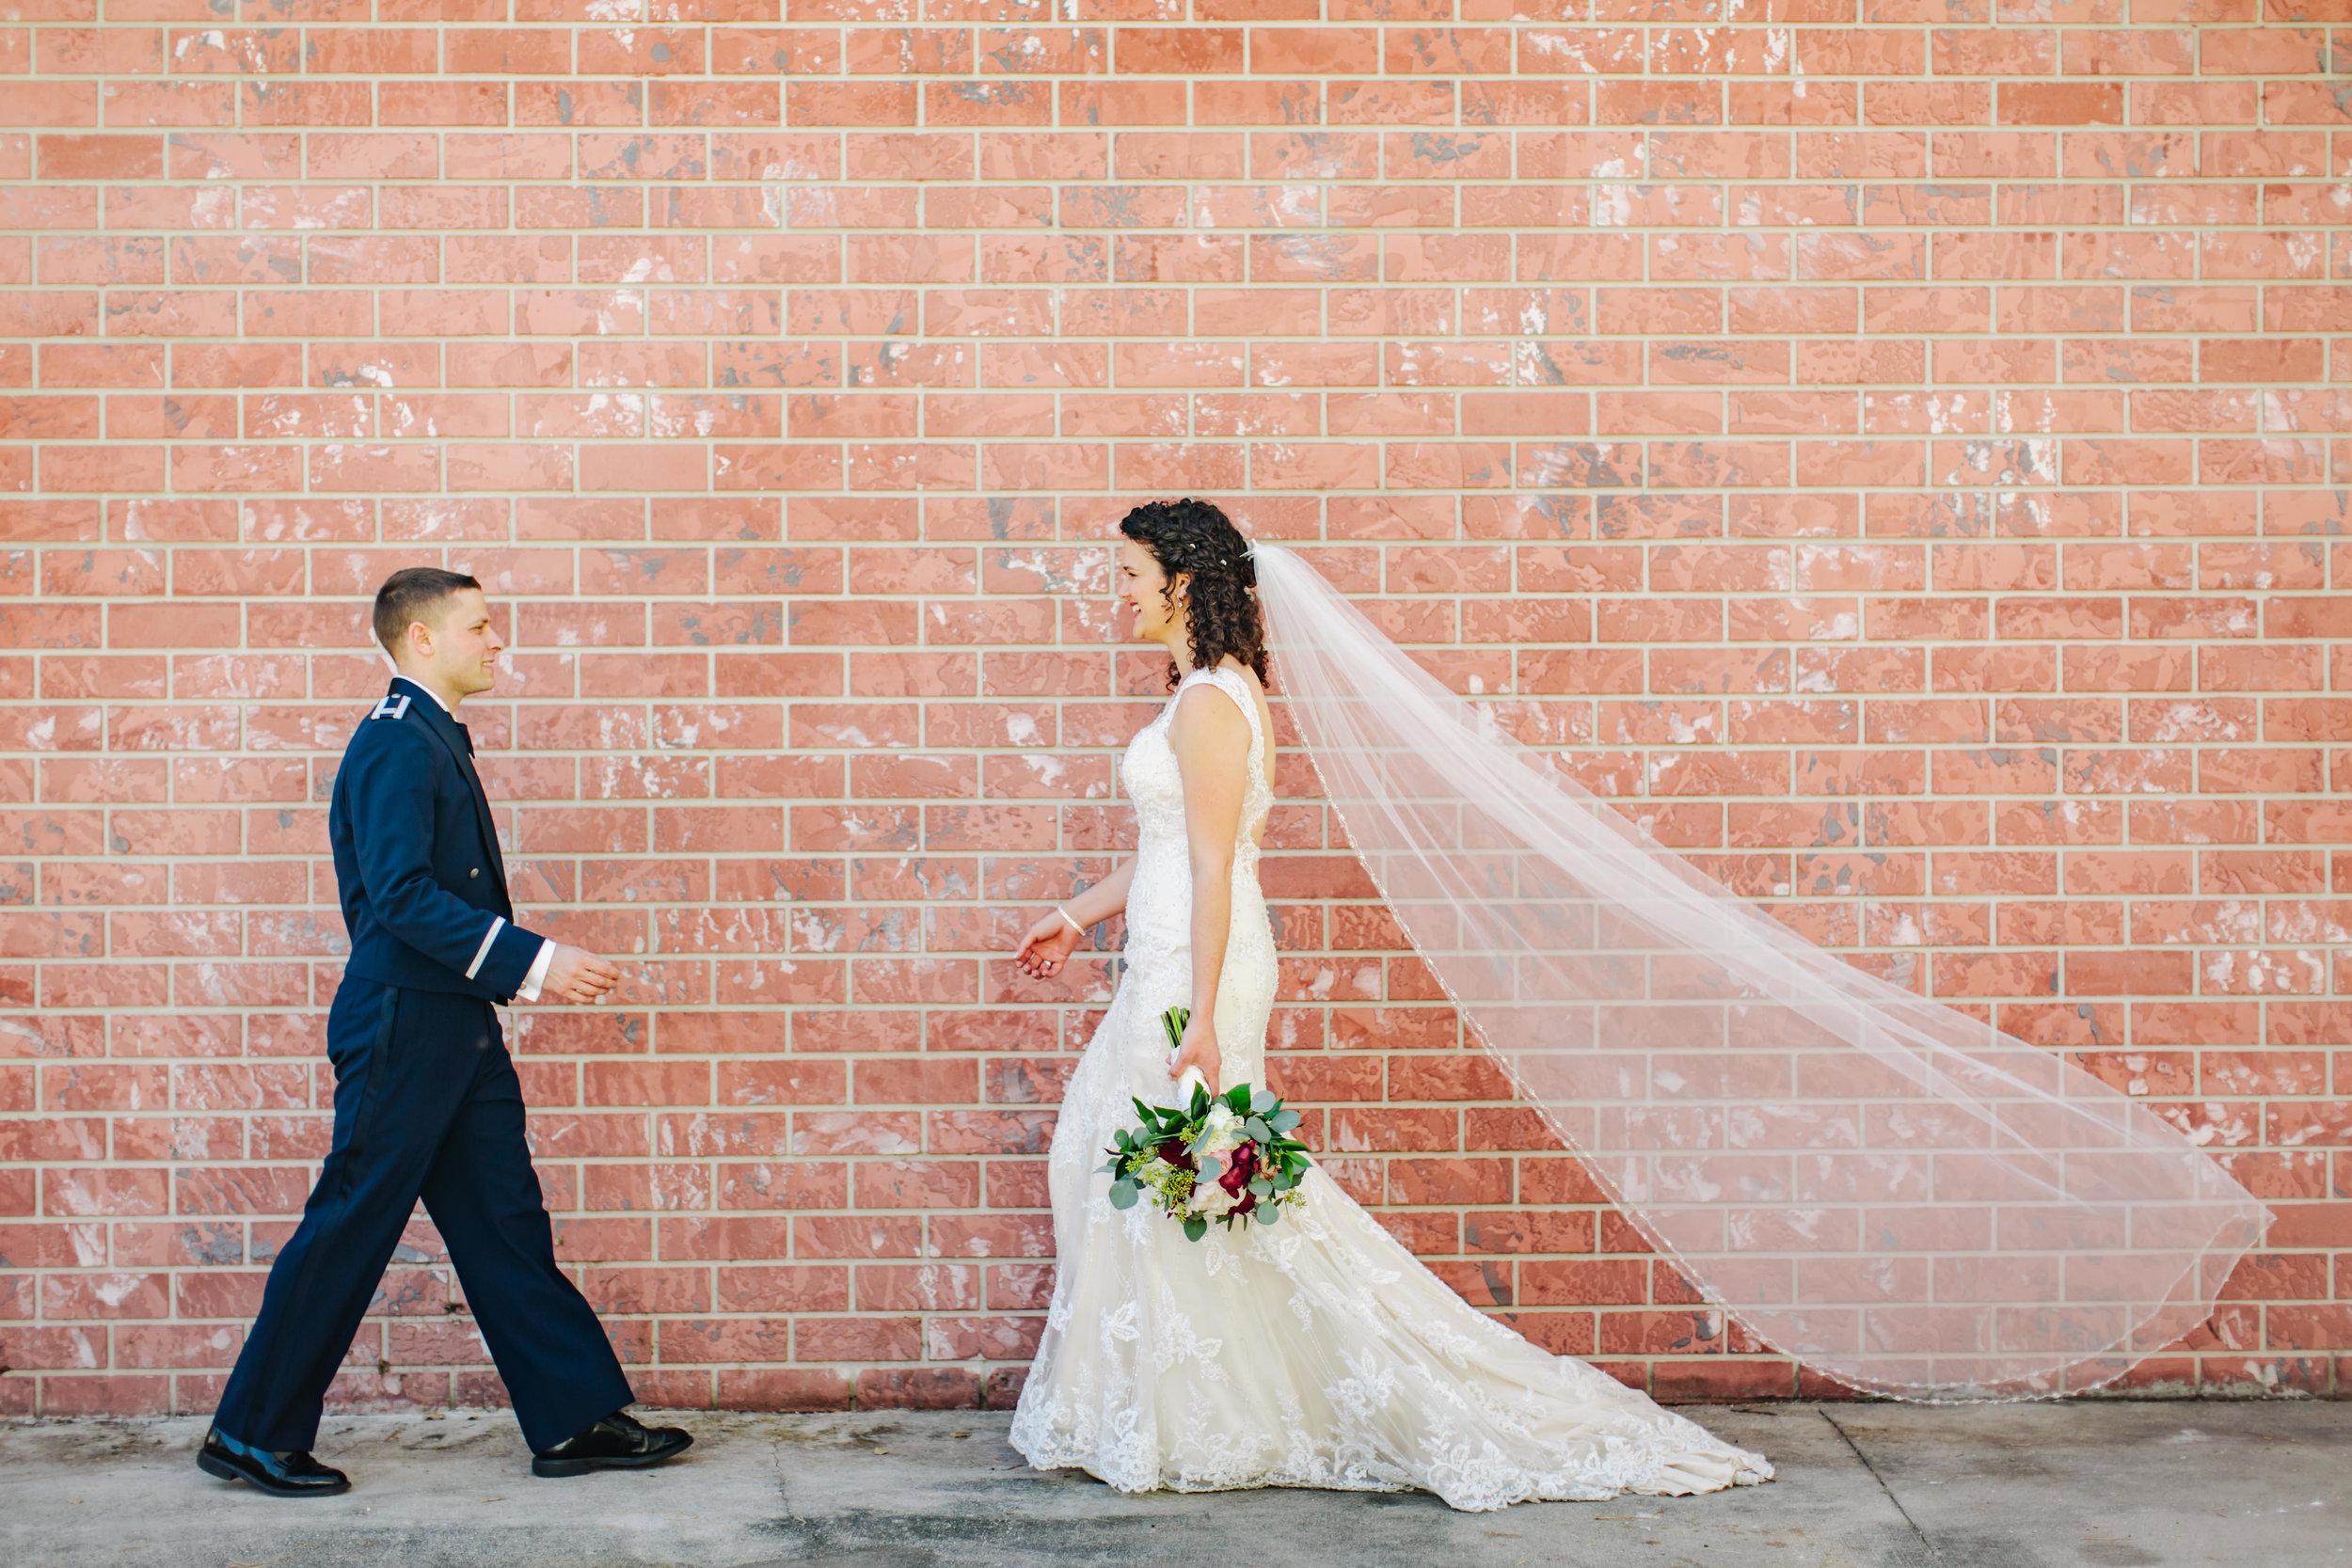 2018.03.17 Allison and Chuck Wedding Waelti Melbourne (489 of 569).jpg